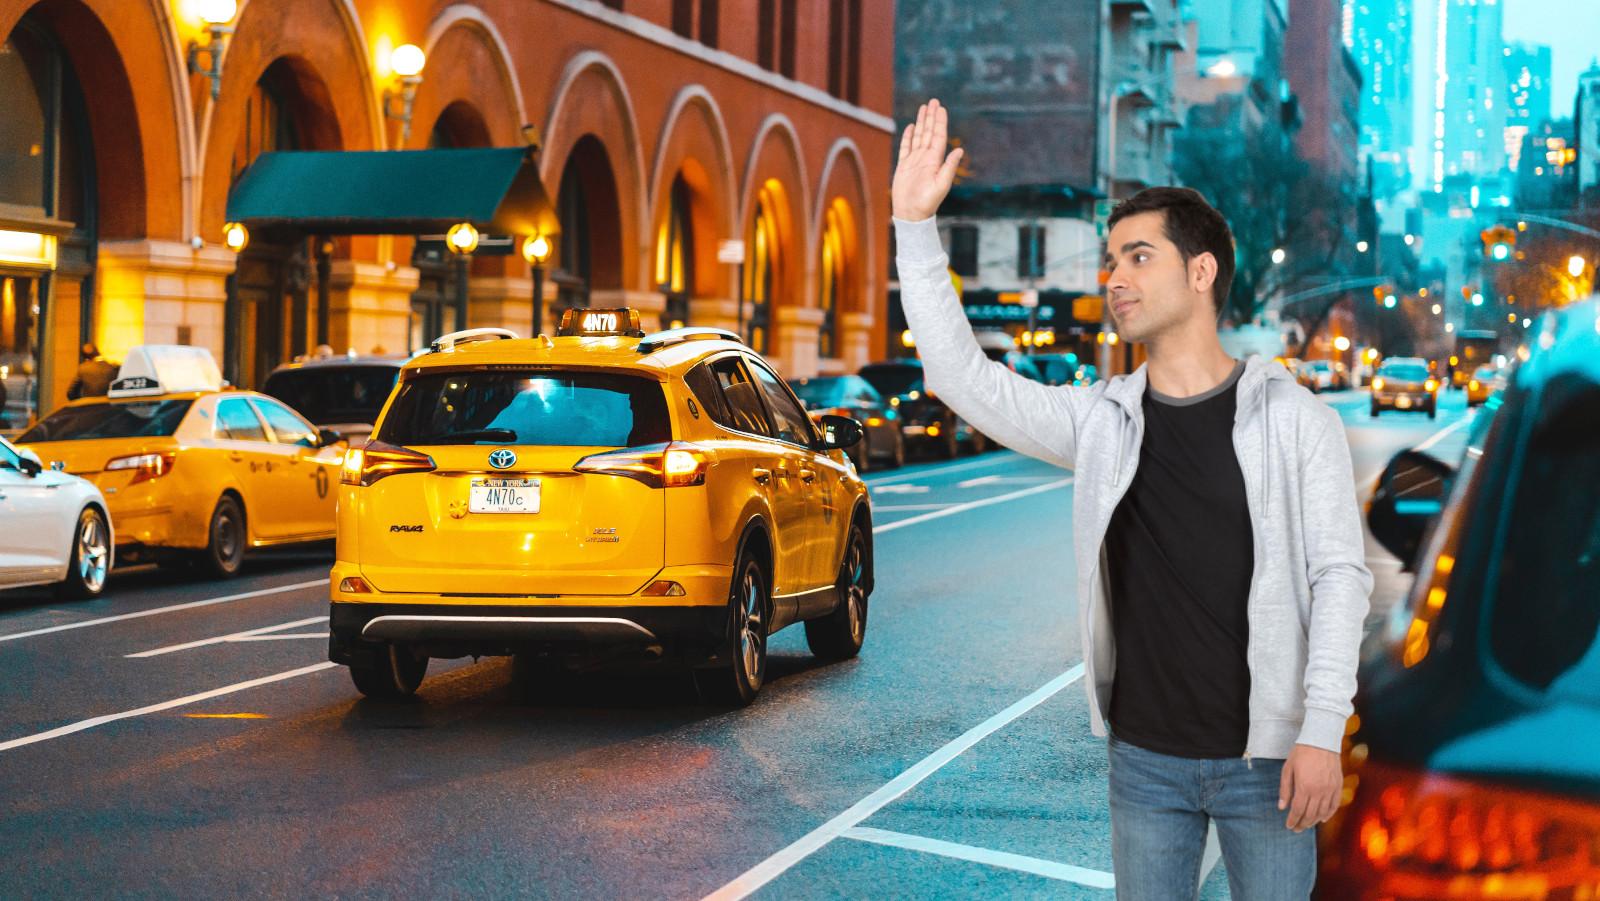 ride, hail, uber, lyft, taxi, new york, car, pickup, dropoff, crash, danger, car